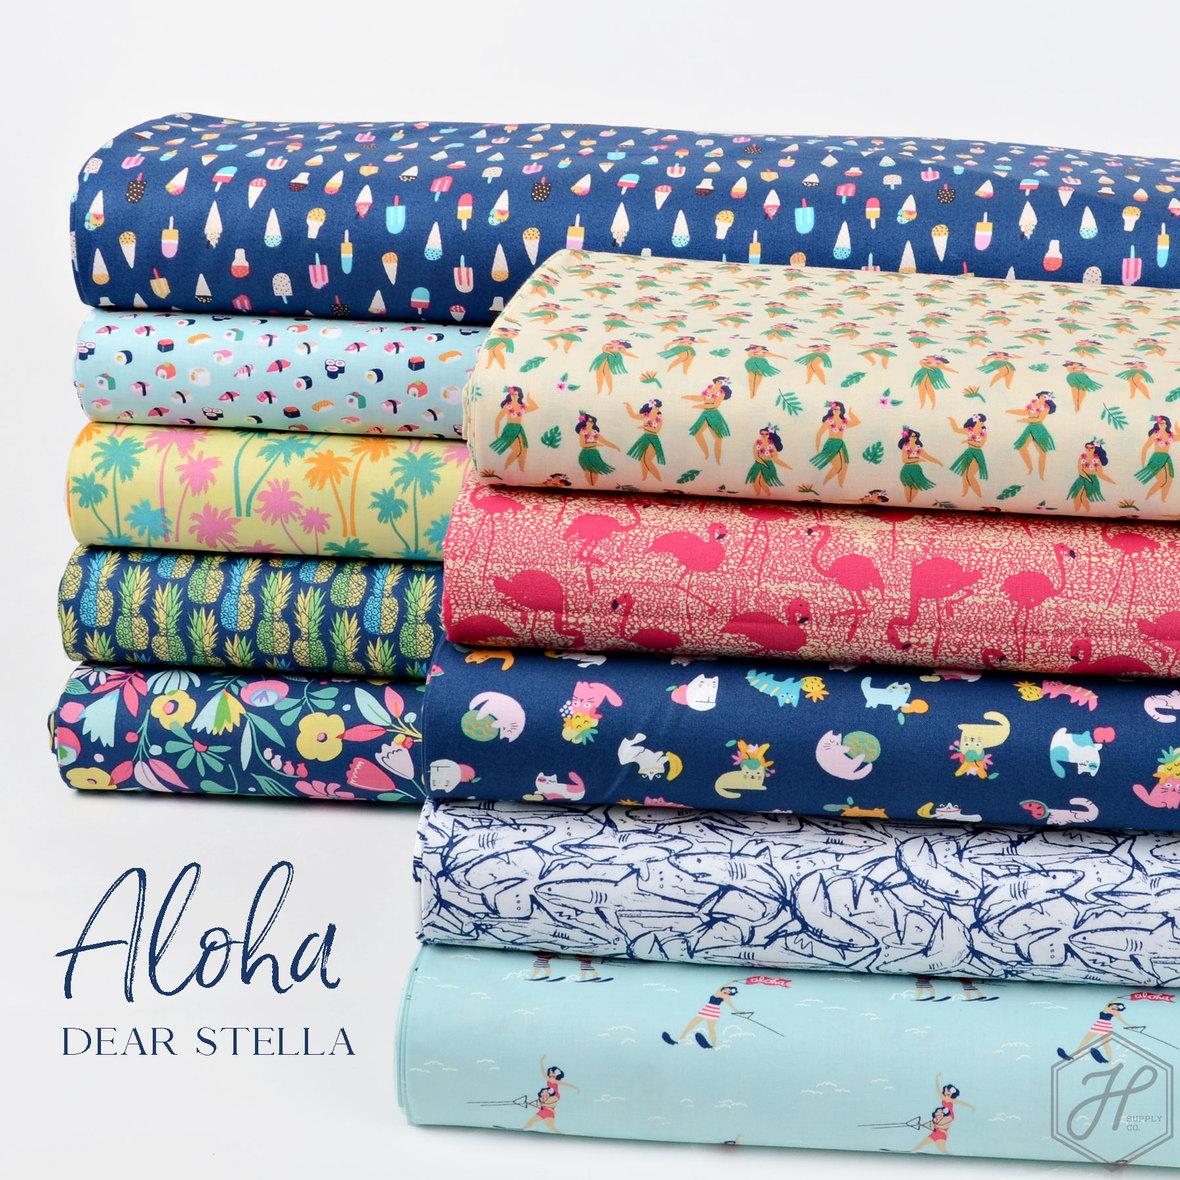 ALoha-Fabric-Dear-Stella-at-Hawthorne-Supply-Co